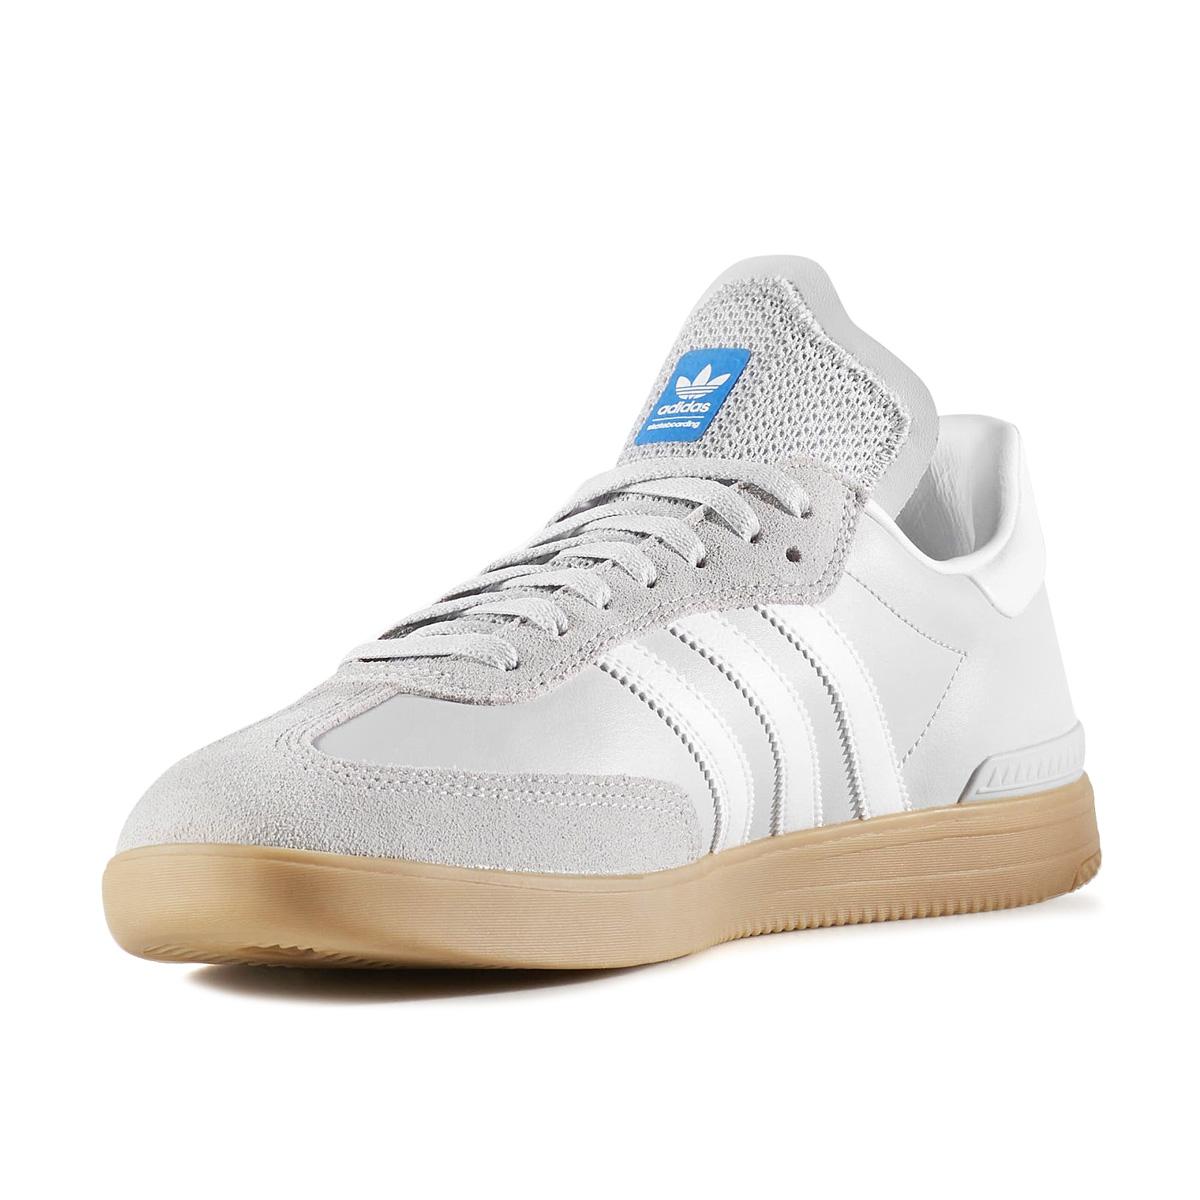 da78a4009 ... adidas Originals SAMBA ADV (Adidas samba ADV) (Solid Grey/Running  White/ ...